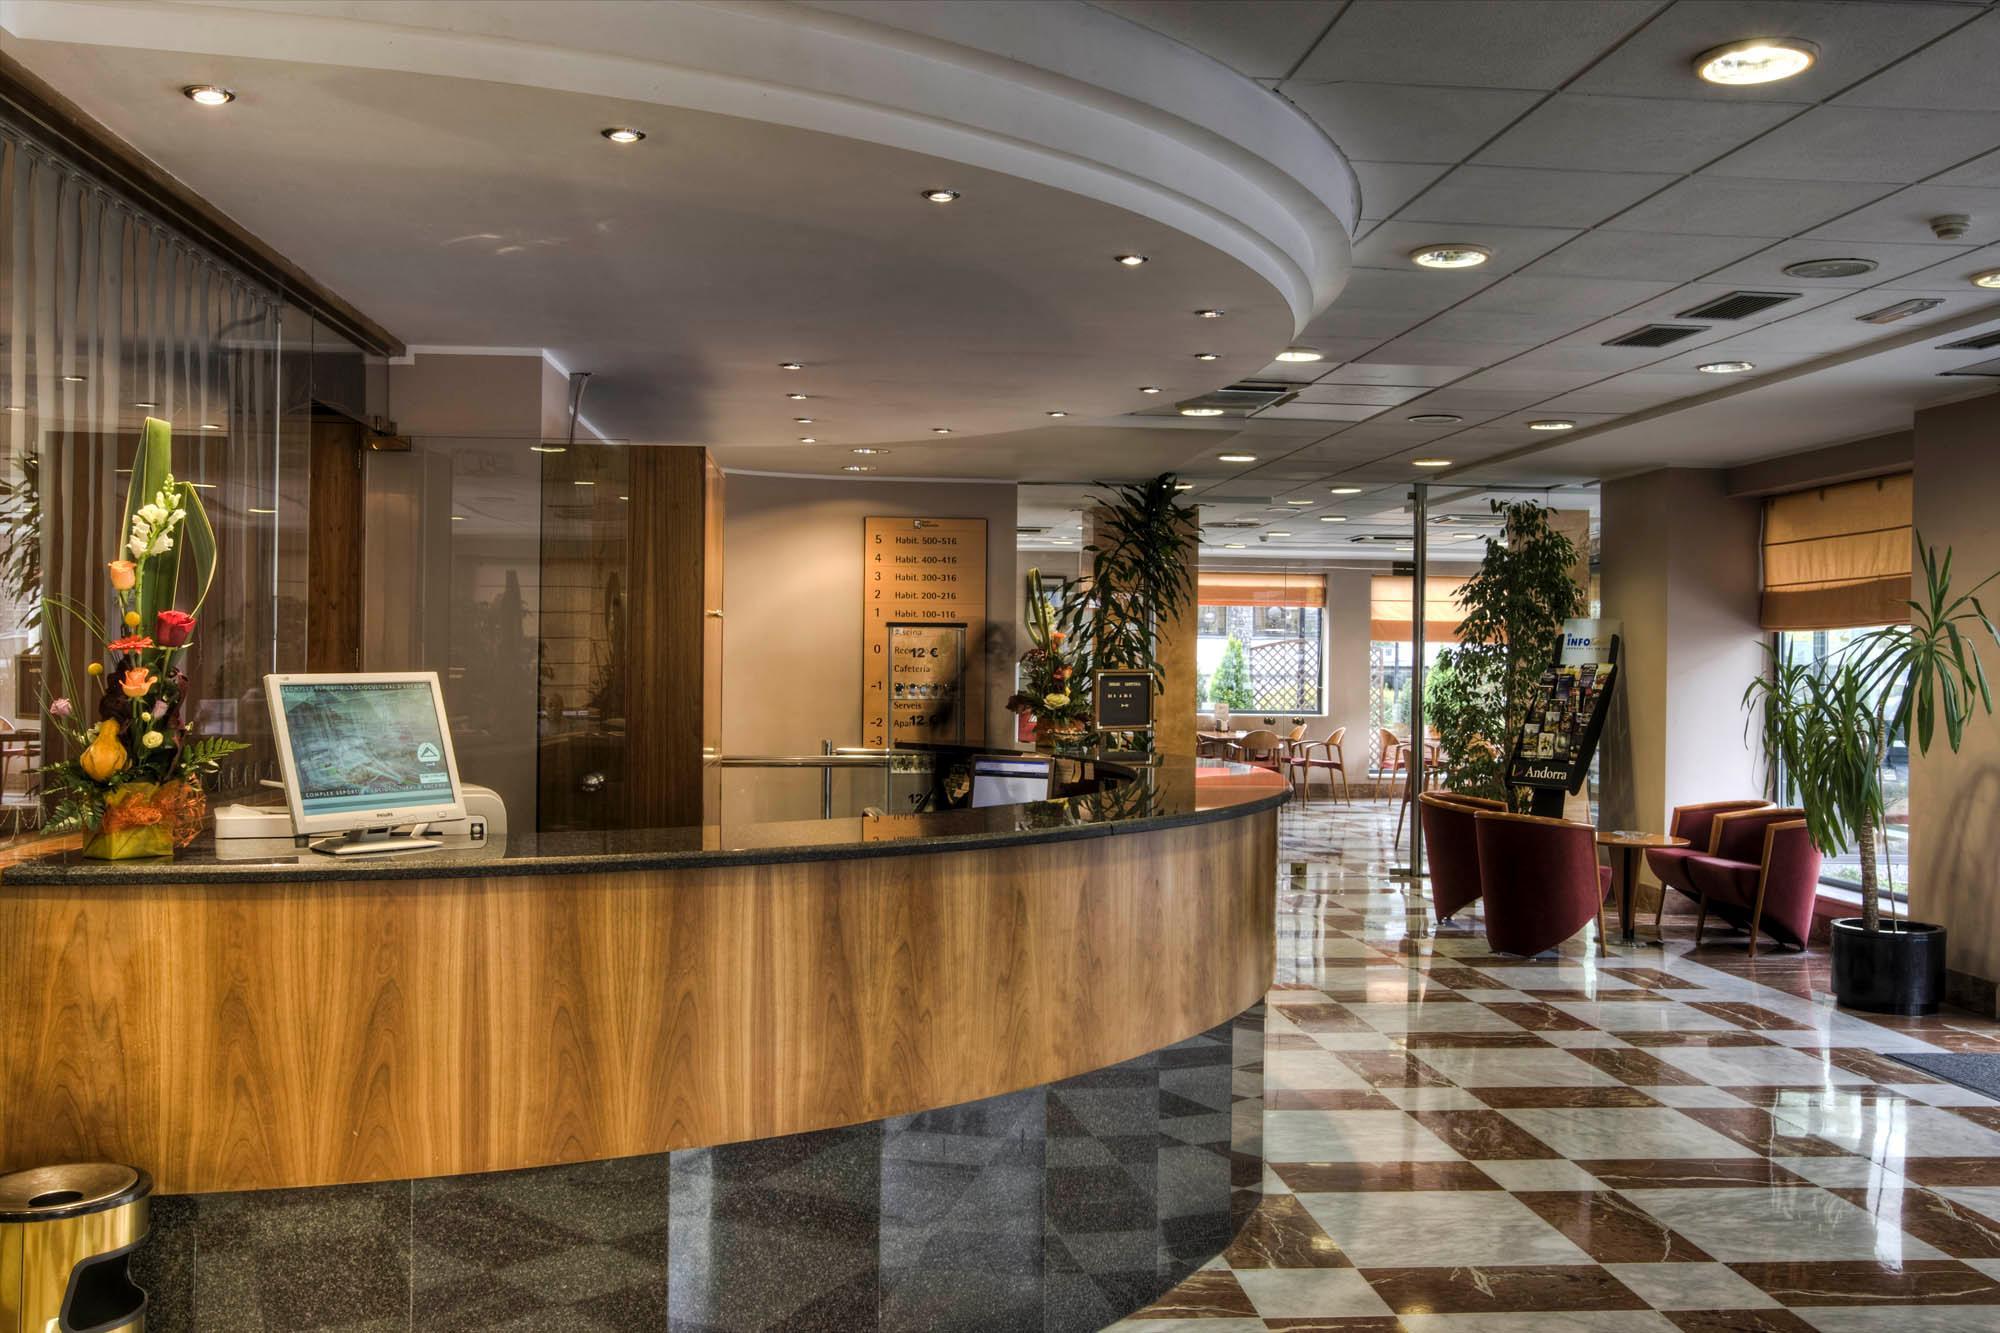 Zenit Diplomatic Hotel